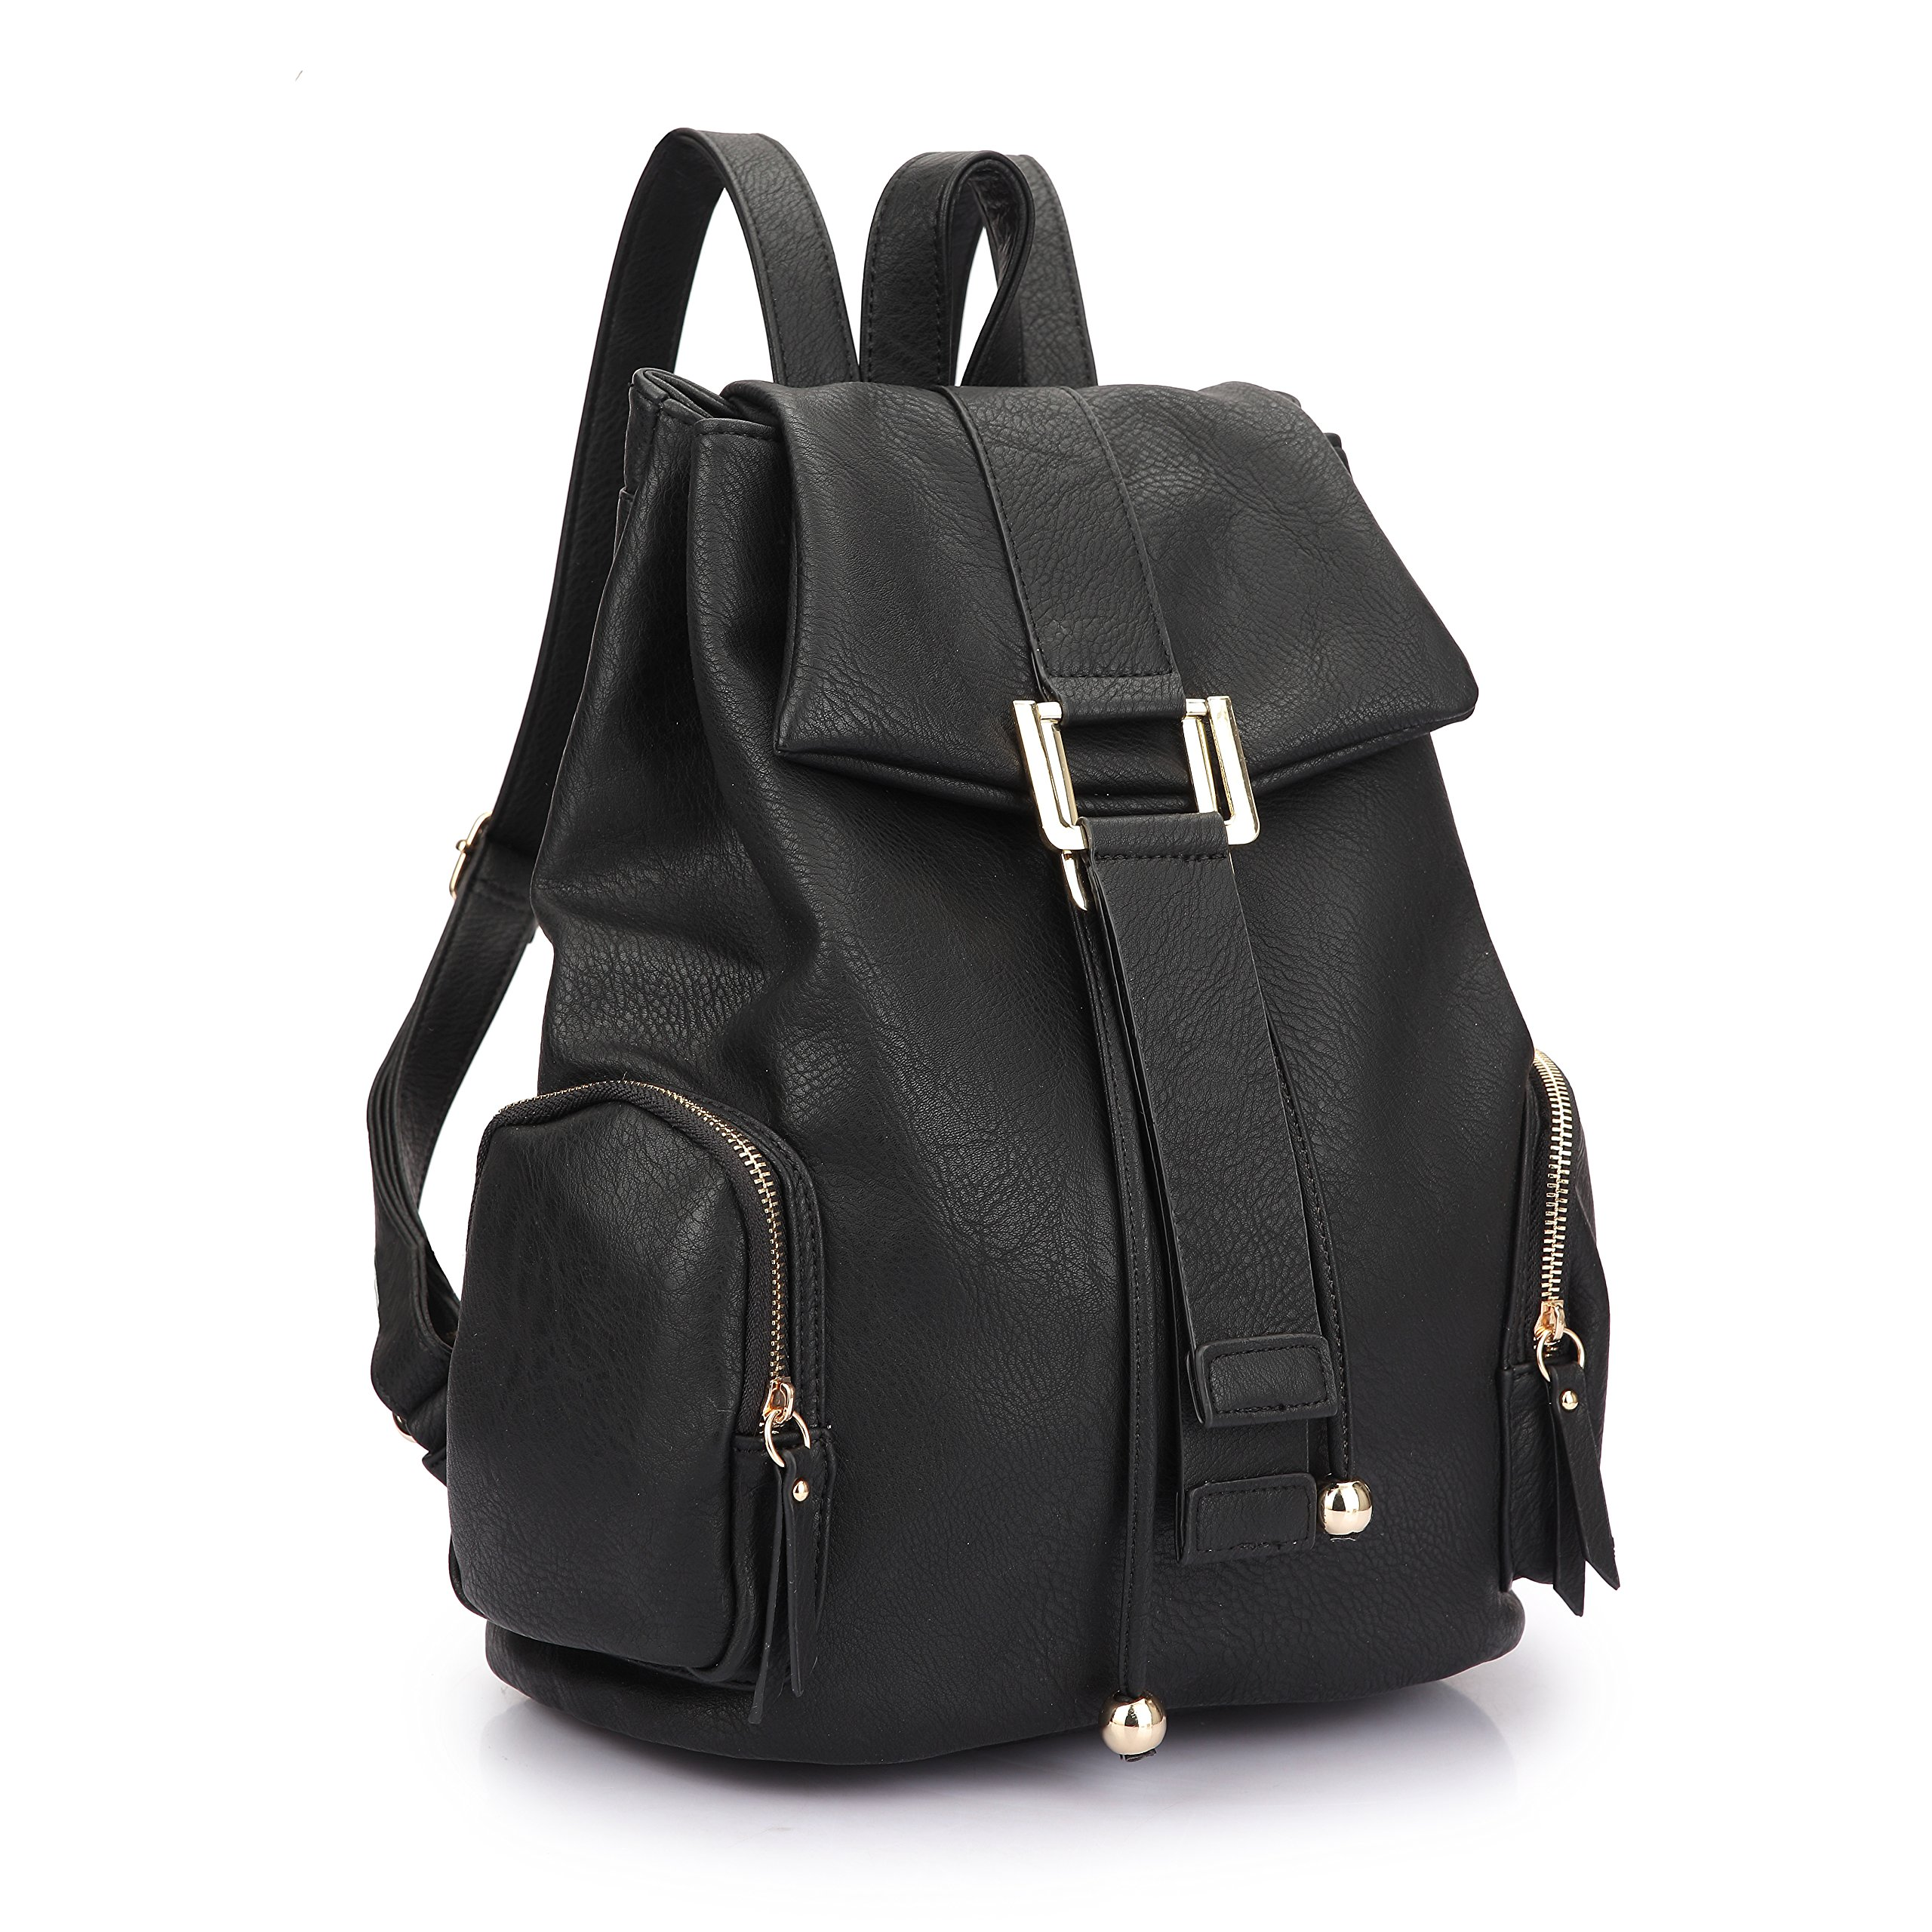 Dasein Casual Backpacks for Women Drawstring School Backpack Purse Versatile Daypacks Travel Bag (2443-black-1)